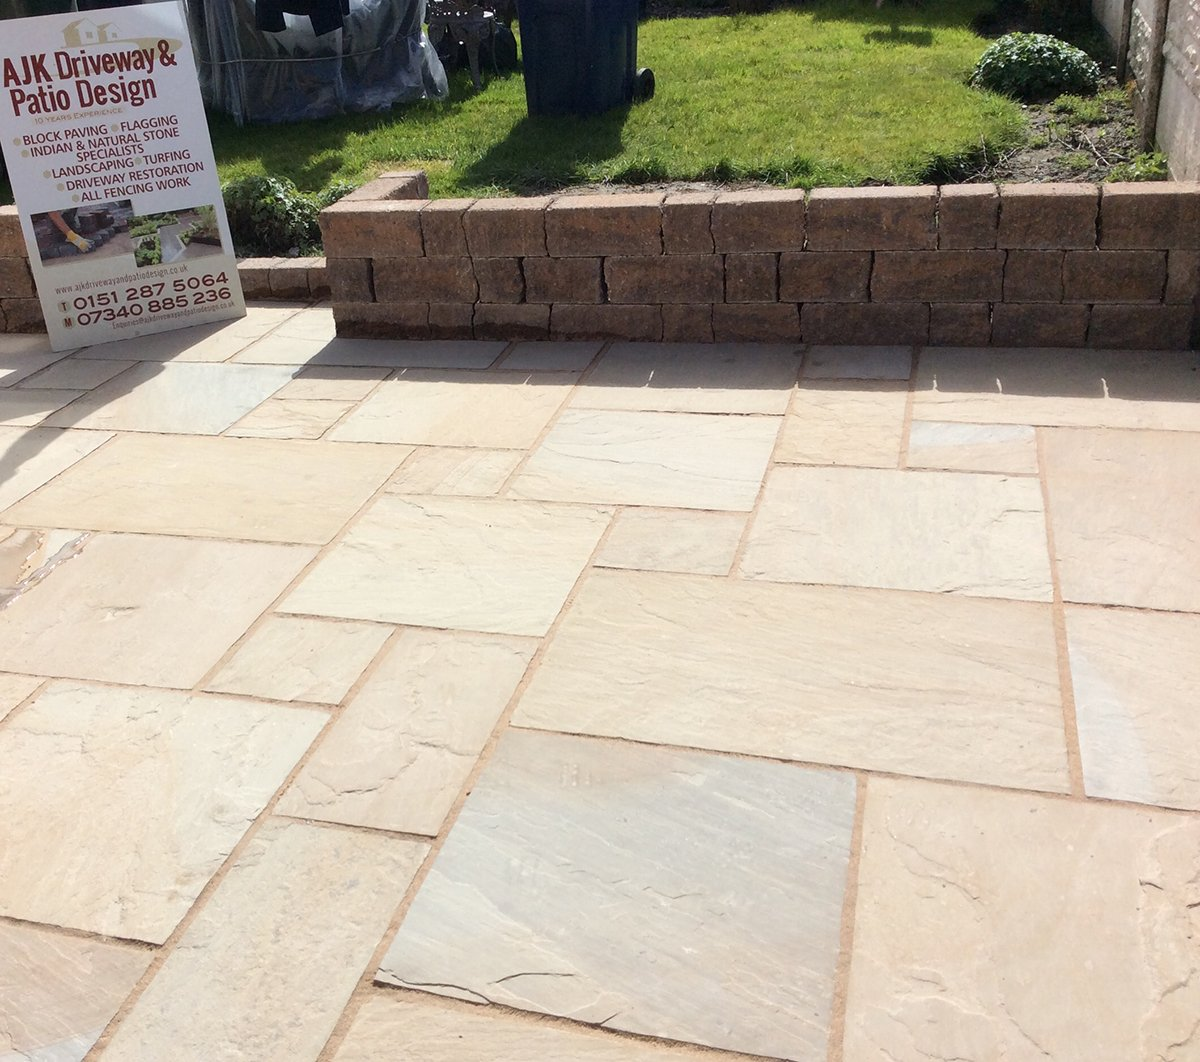 Light stone patio